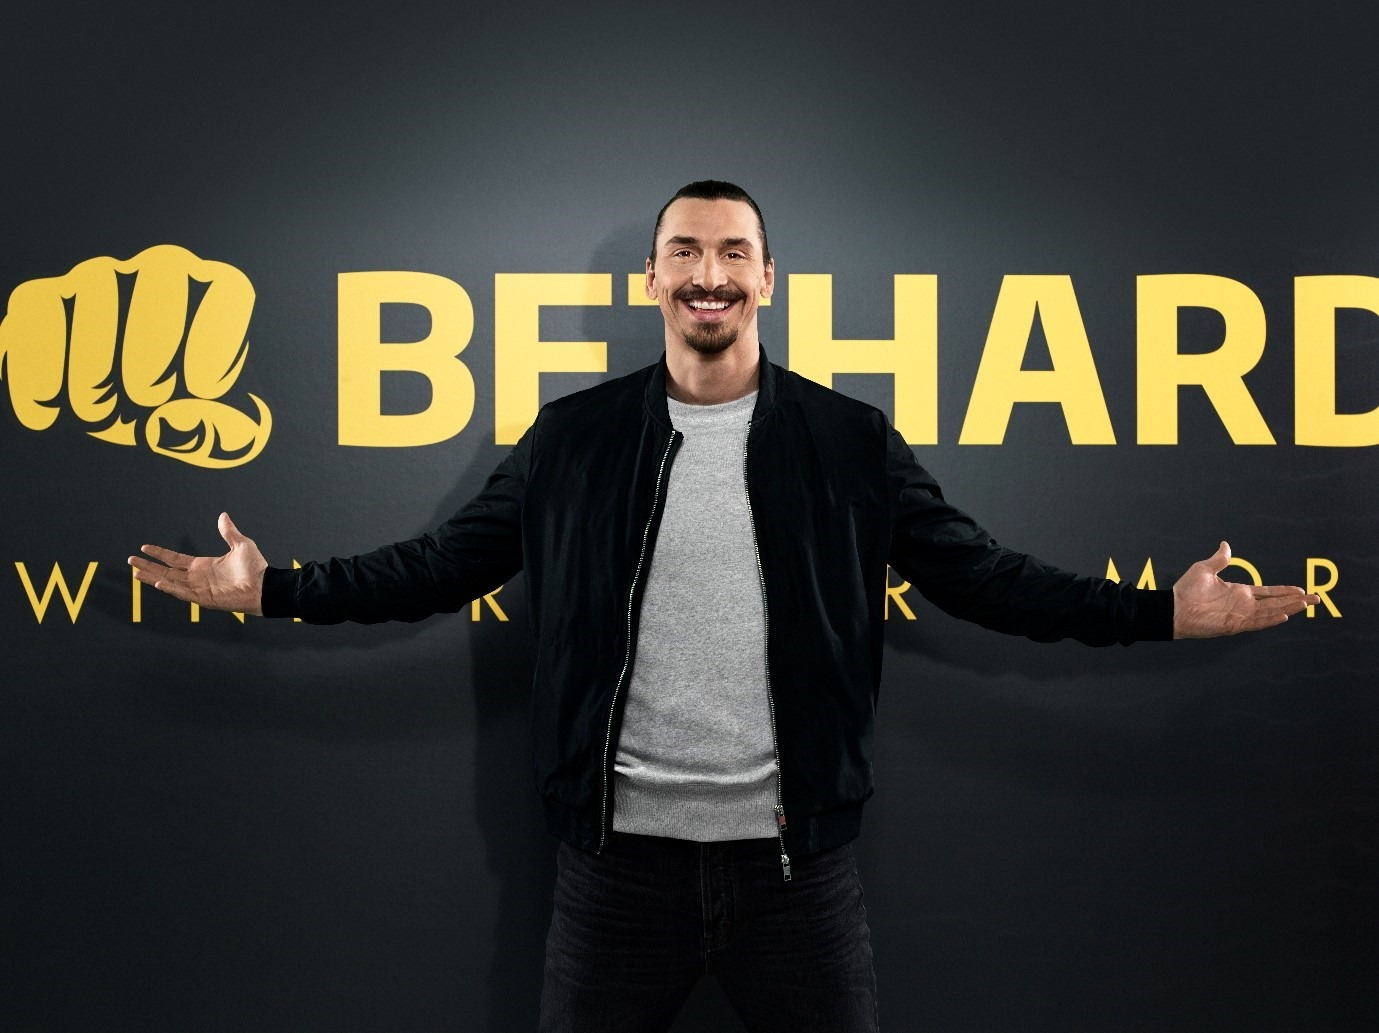 Den svenske fodboldspiller Zlatan Ibrahimovic foran et Bethard logo